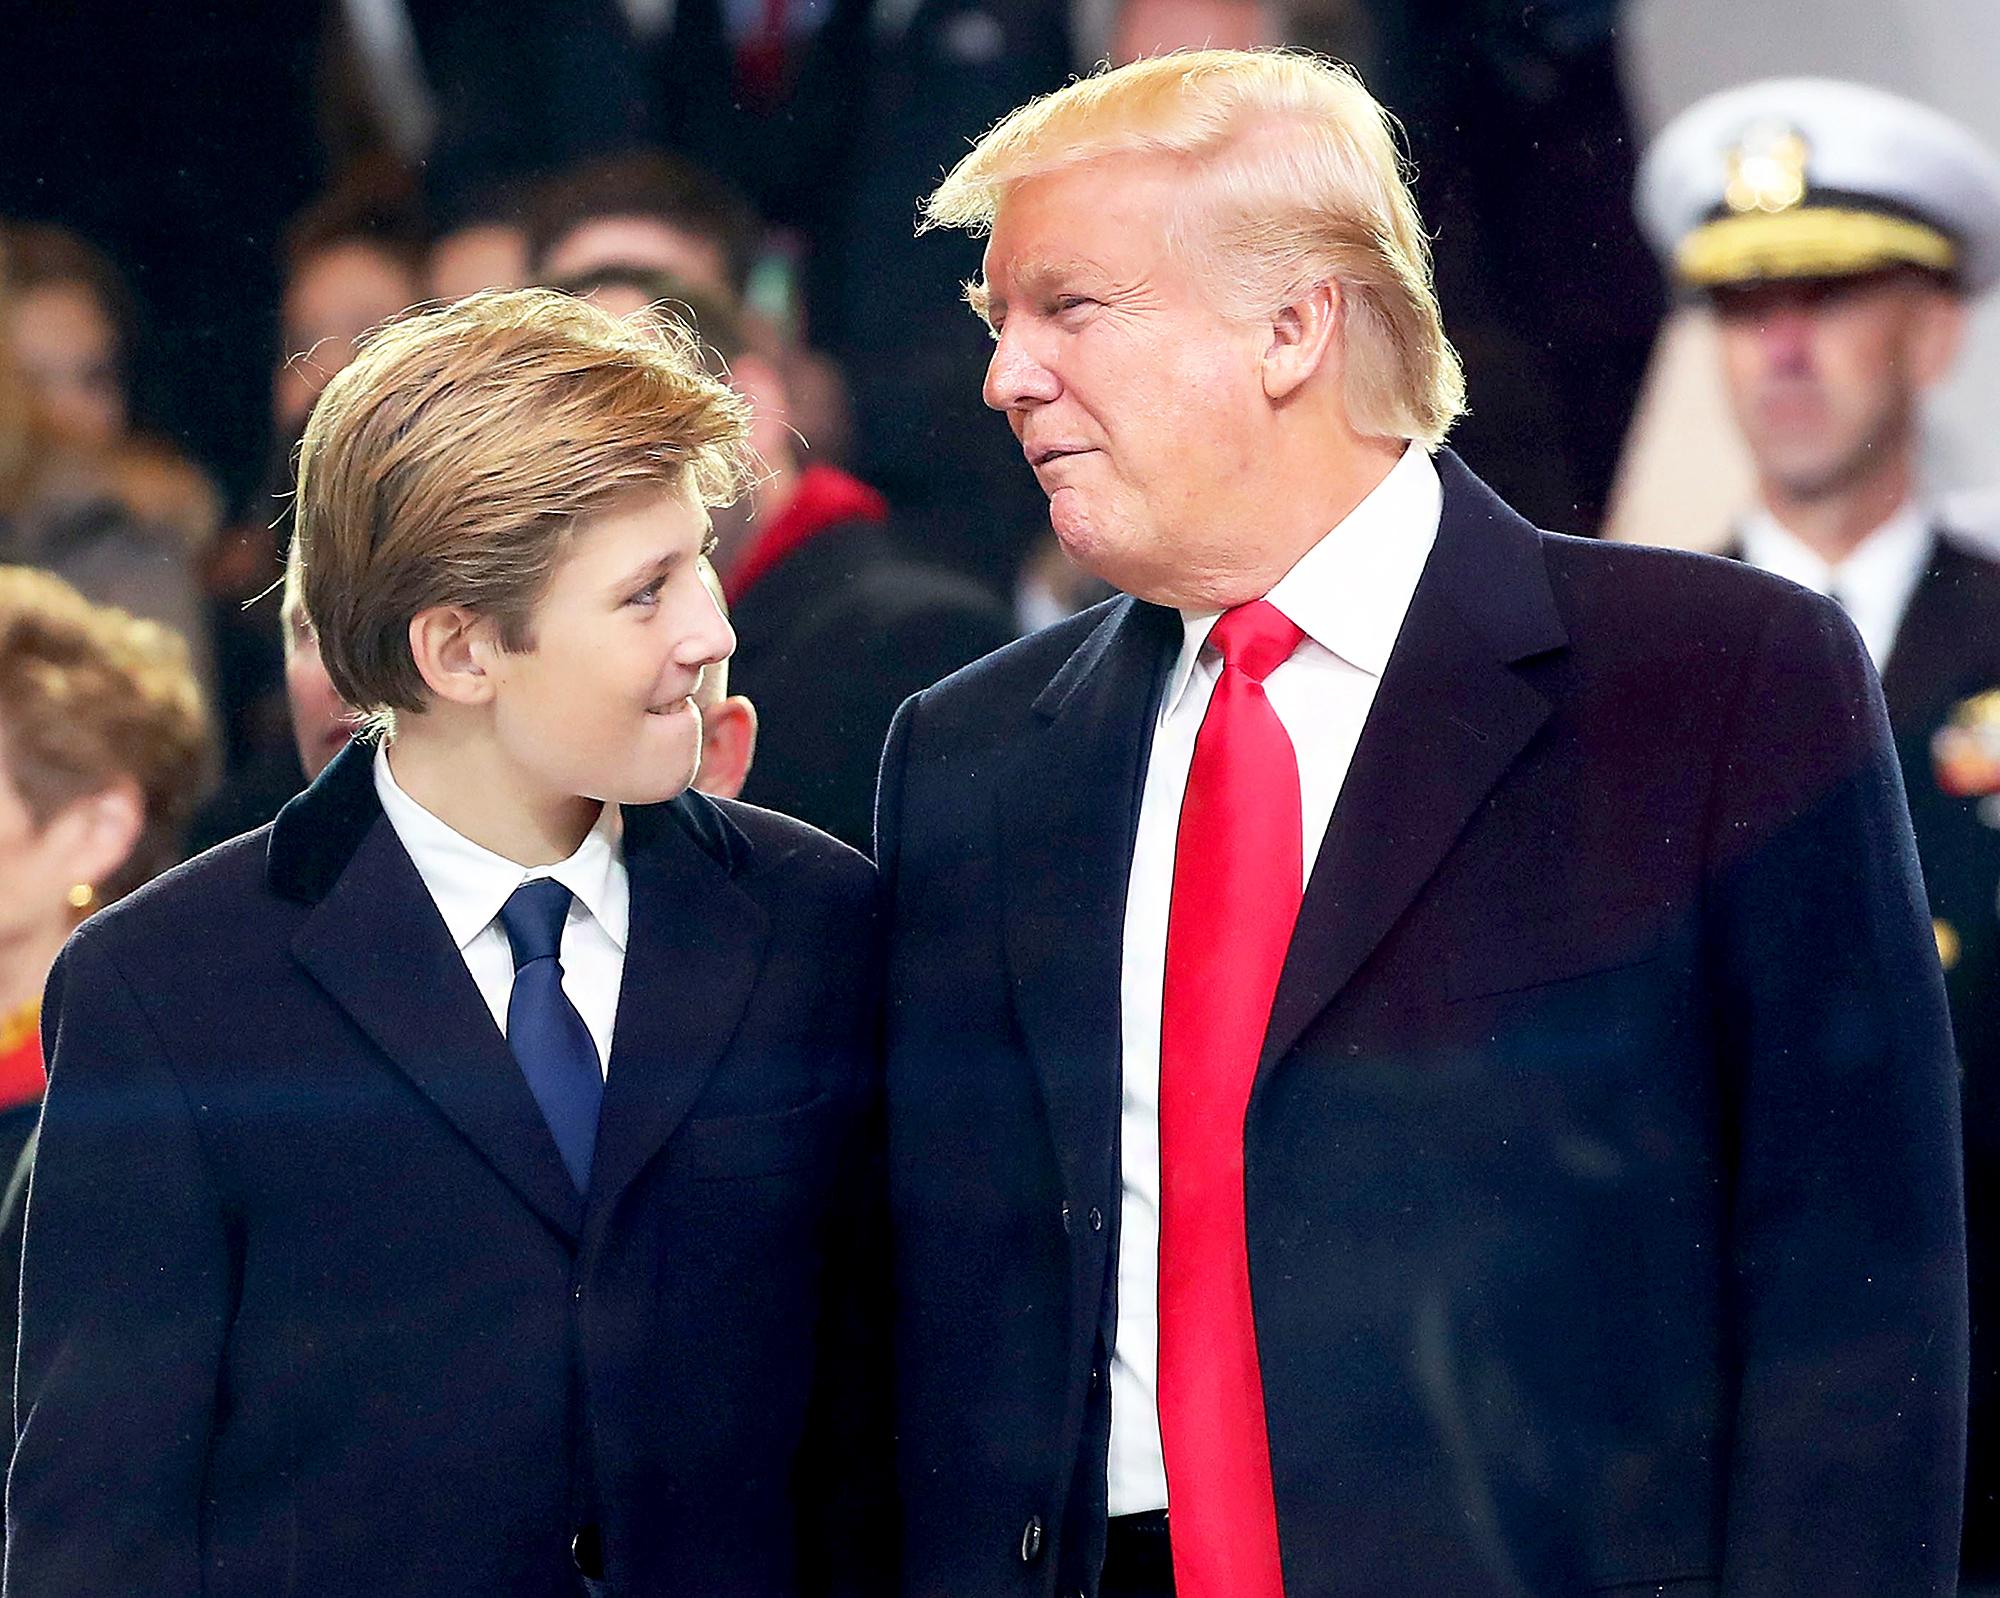 Barron Trump and Donald Trump